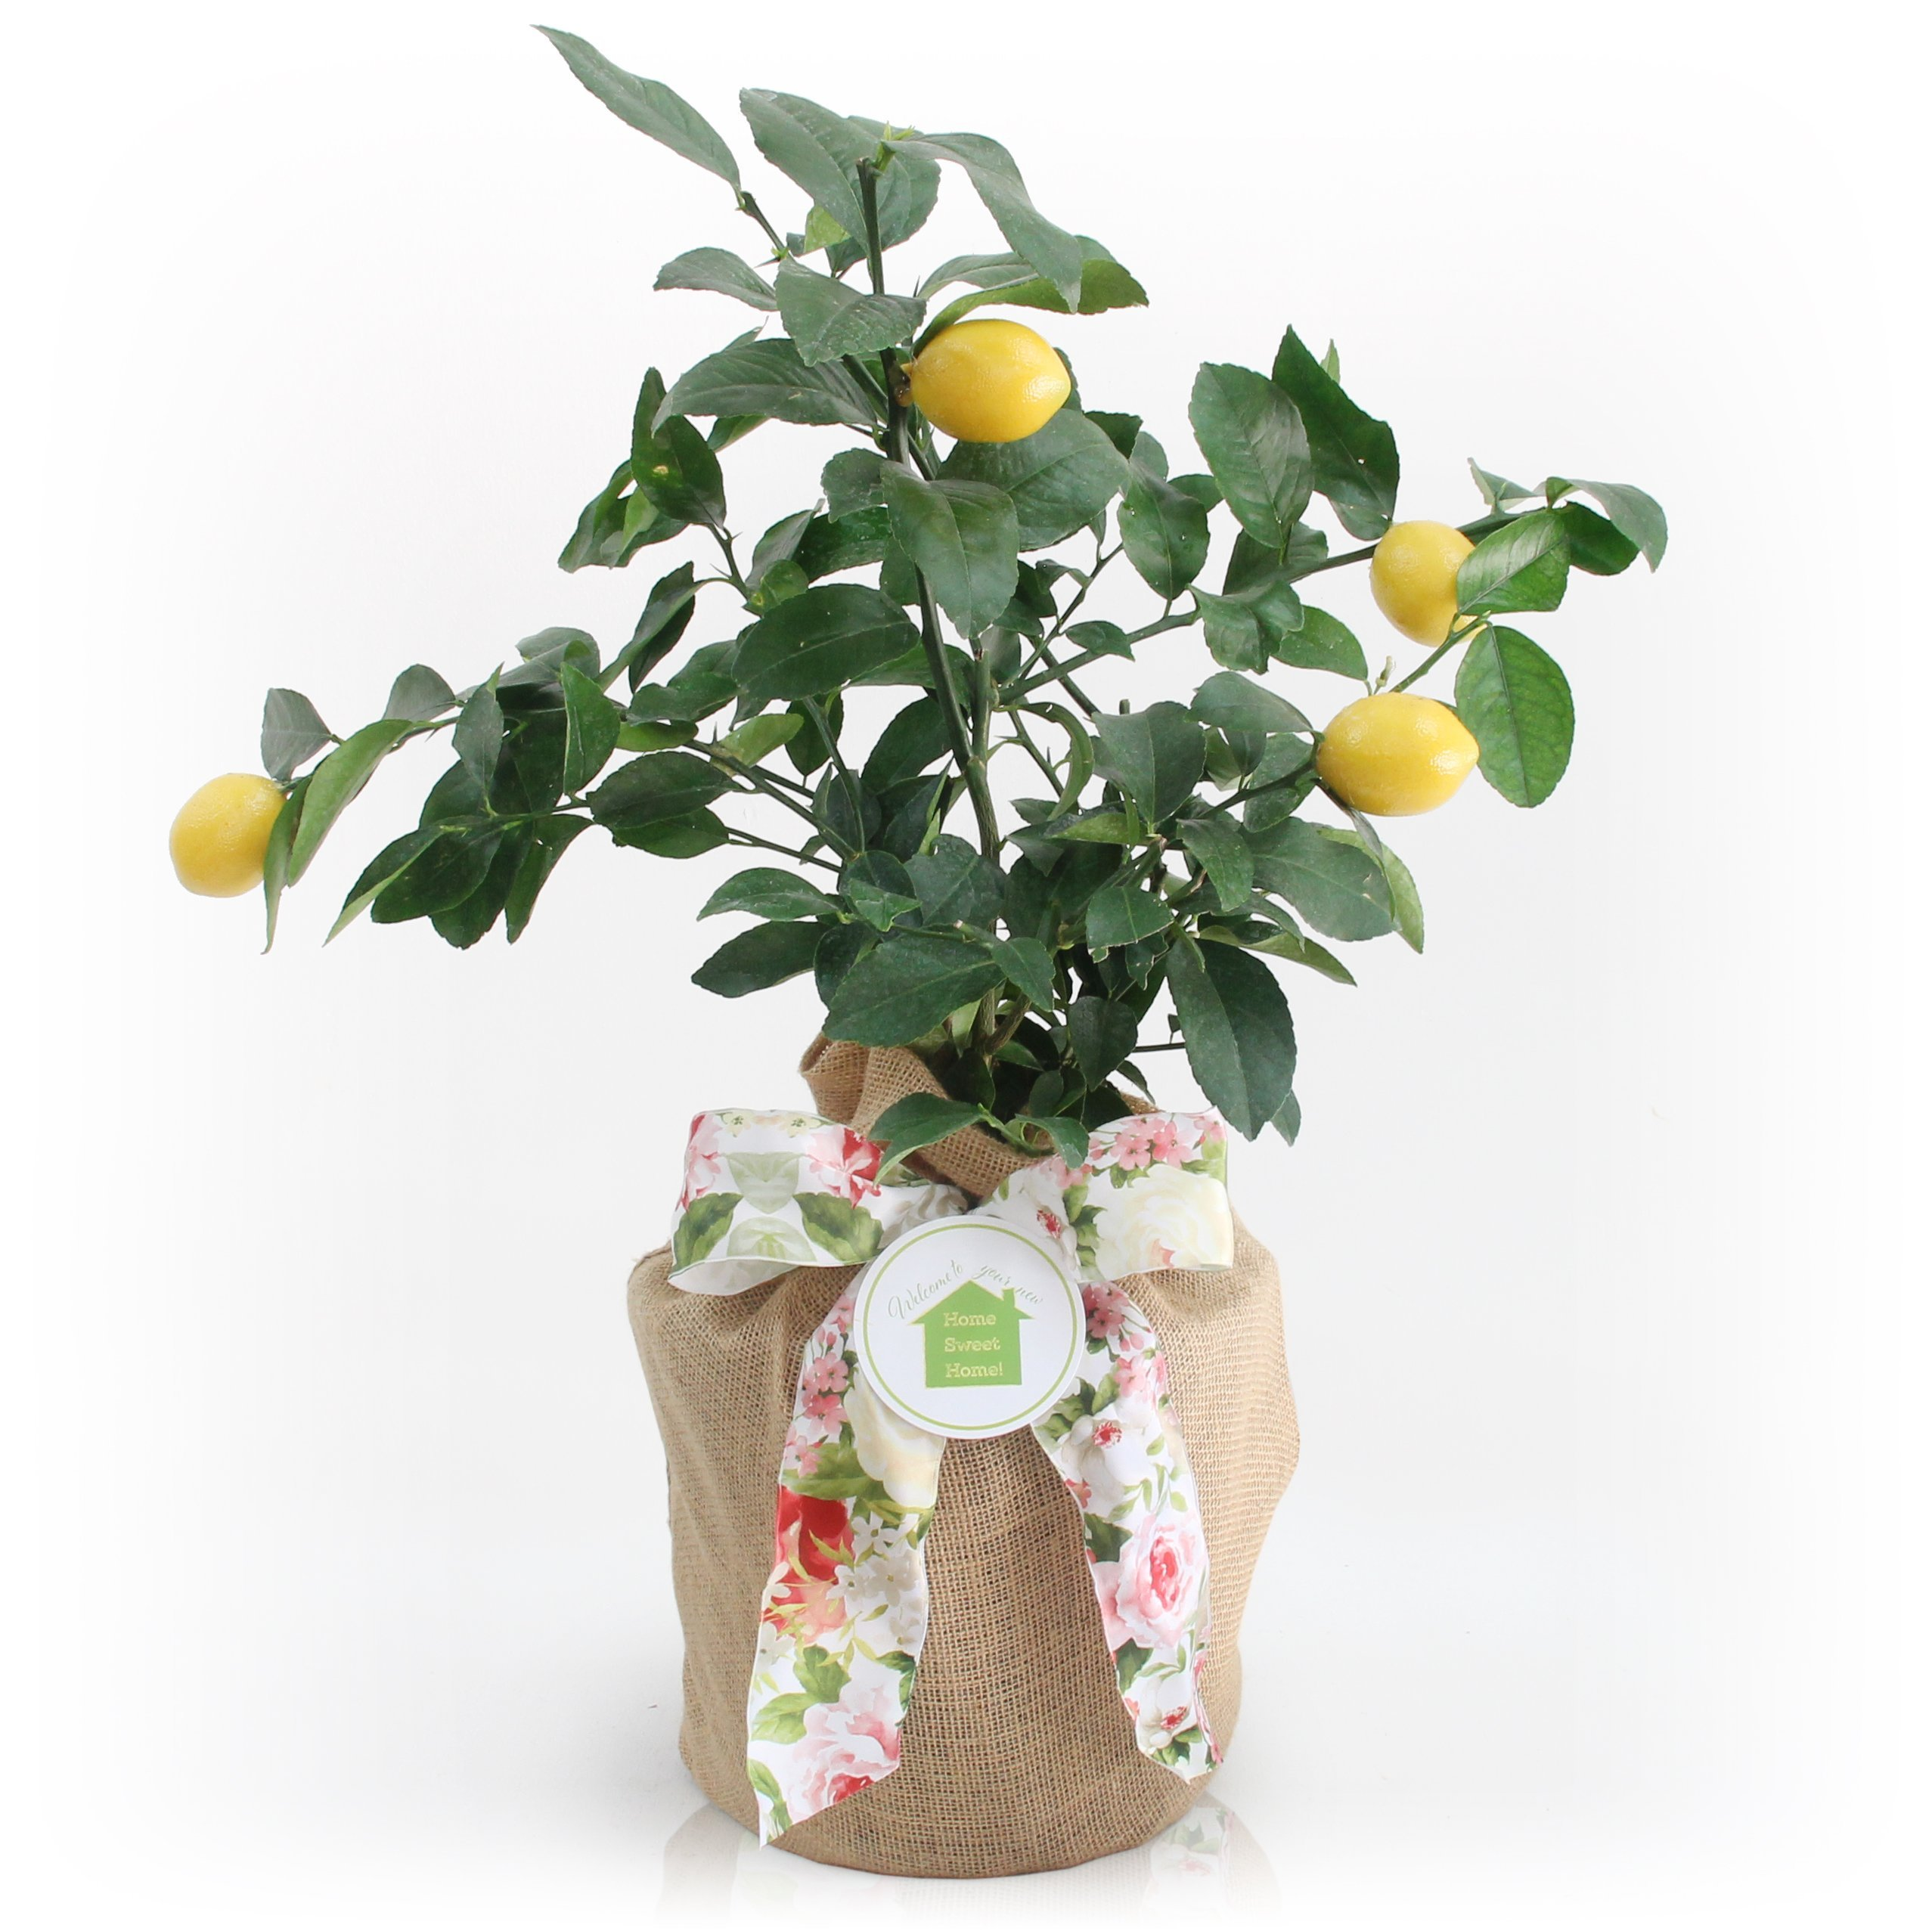 Housewarming Meyer Lemon Gift Tree by The Magnolia Company - Get Fruit 1st Year, Dwarf Fruit Tree with Juicy Sweet Lemons, NO Ship to TX, LA, AZ and CA by The Magnolia Company (Image #1)